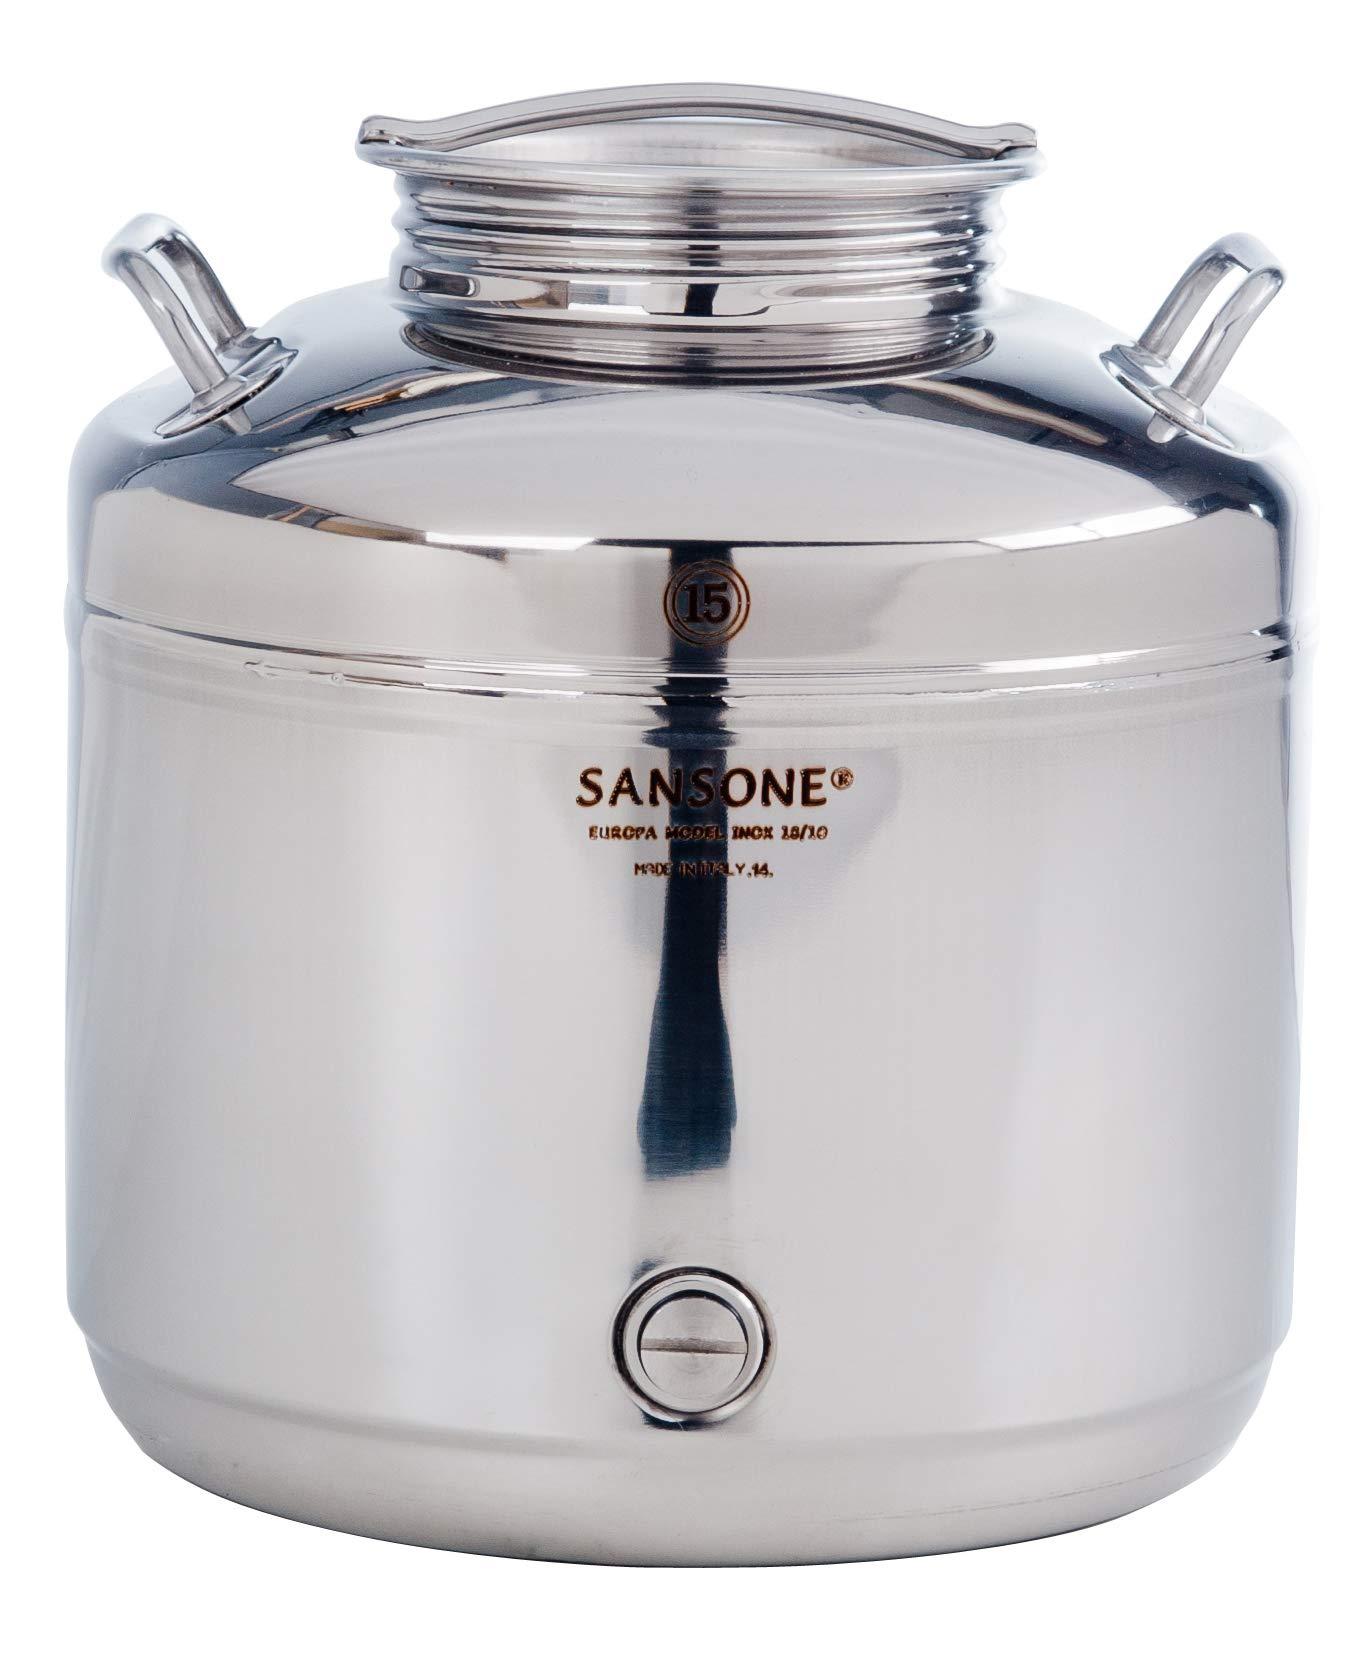 Sansone NSF Stainless Steel Water Dispenser with Spigot, 3.96 gallon, 15 Liters, Silver